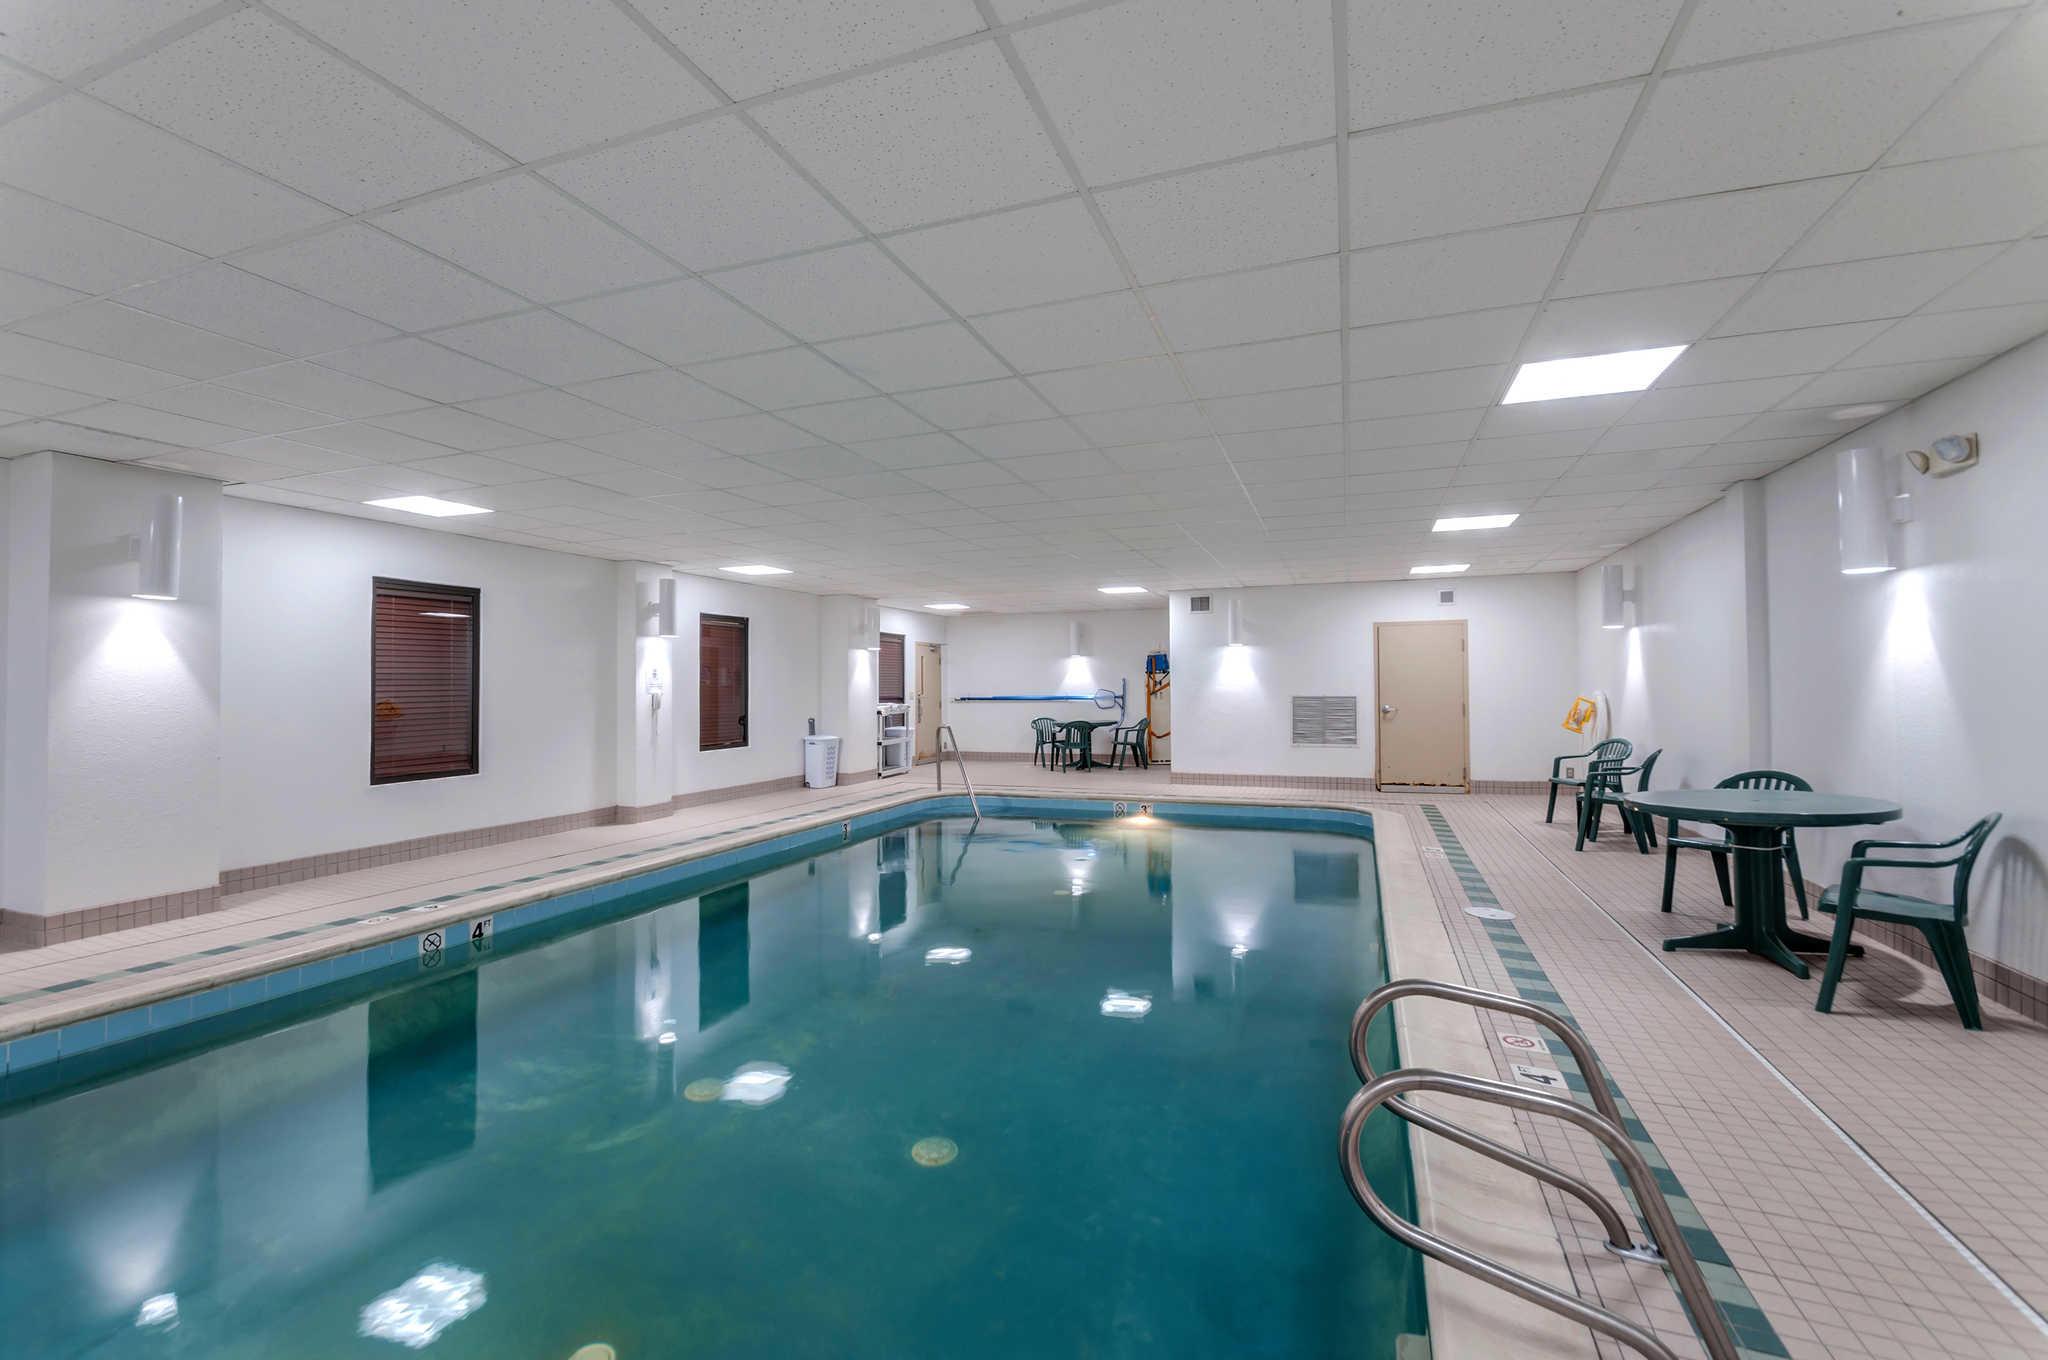 Comfort Inn & Suites Edgewood - Aberdeen image 25